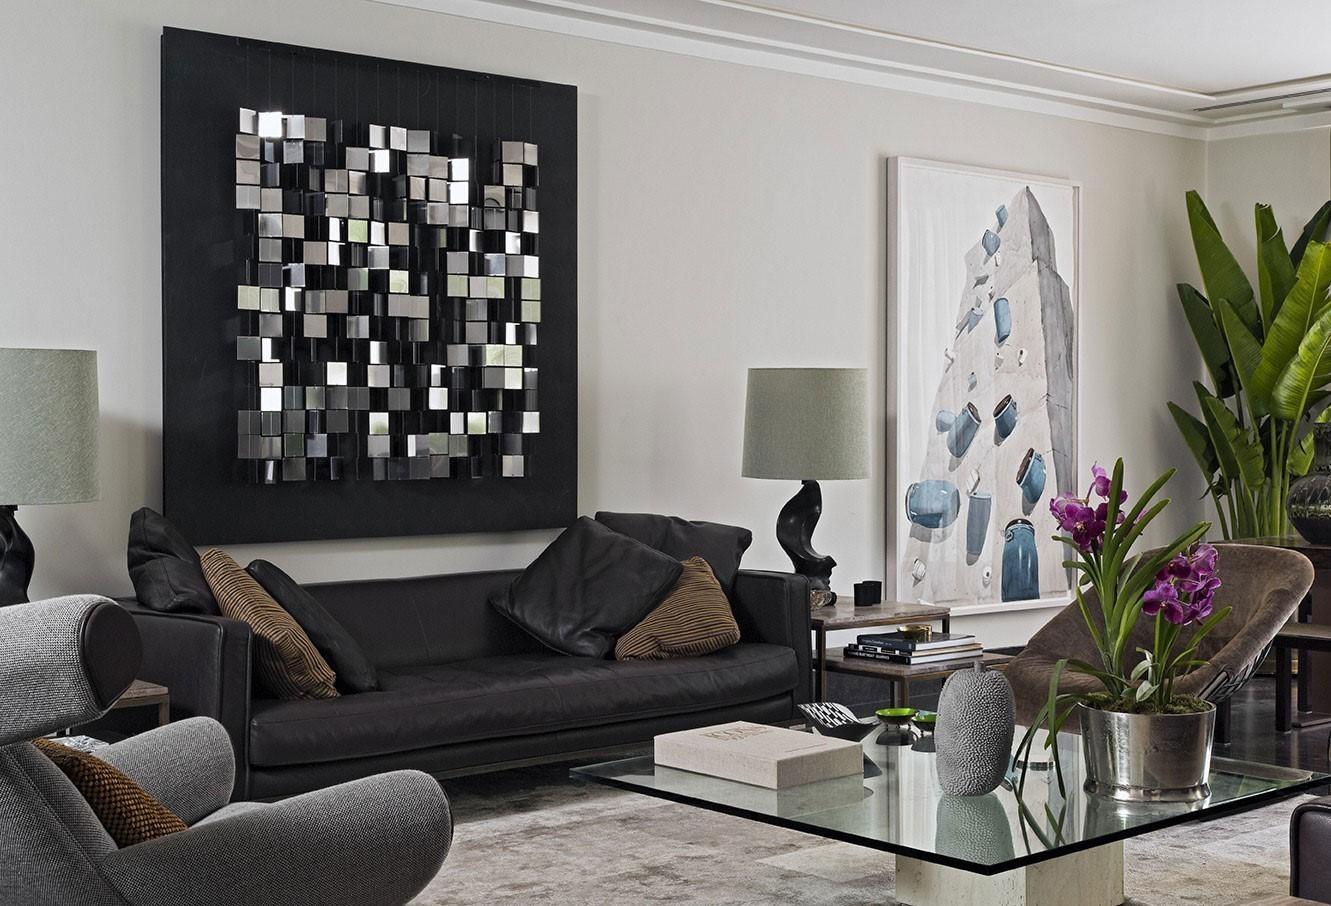 Black Sofa Decor | Sofa Gallery | Kengire For Black Sofas Decors (Image 10 of 20)